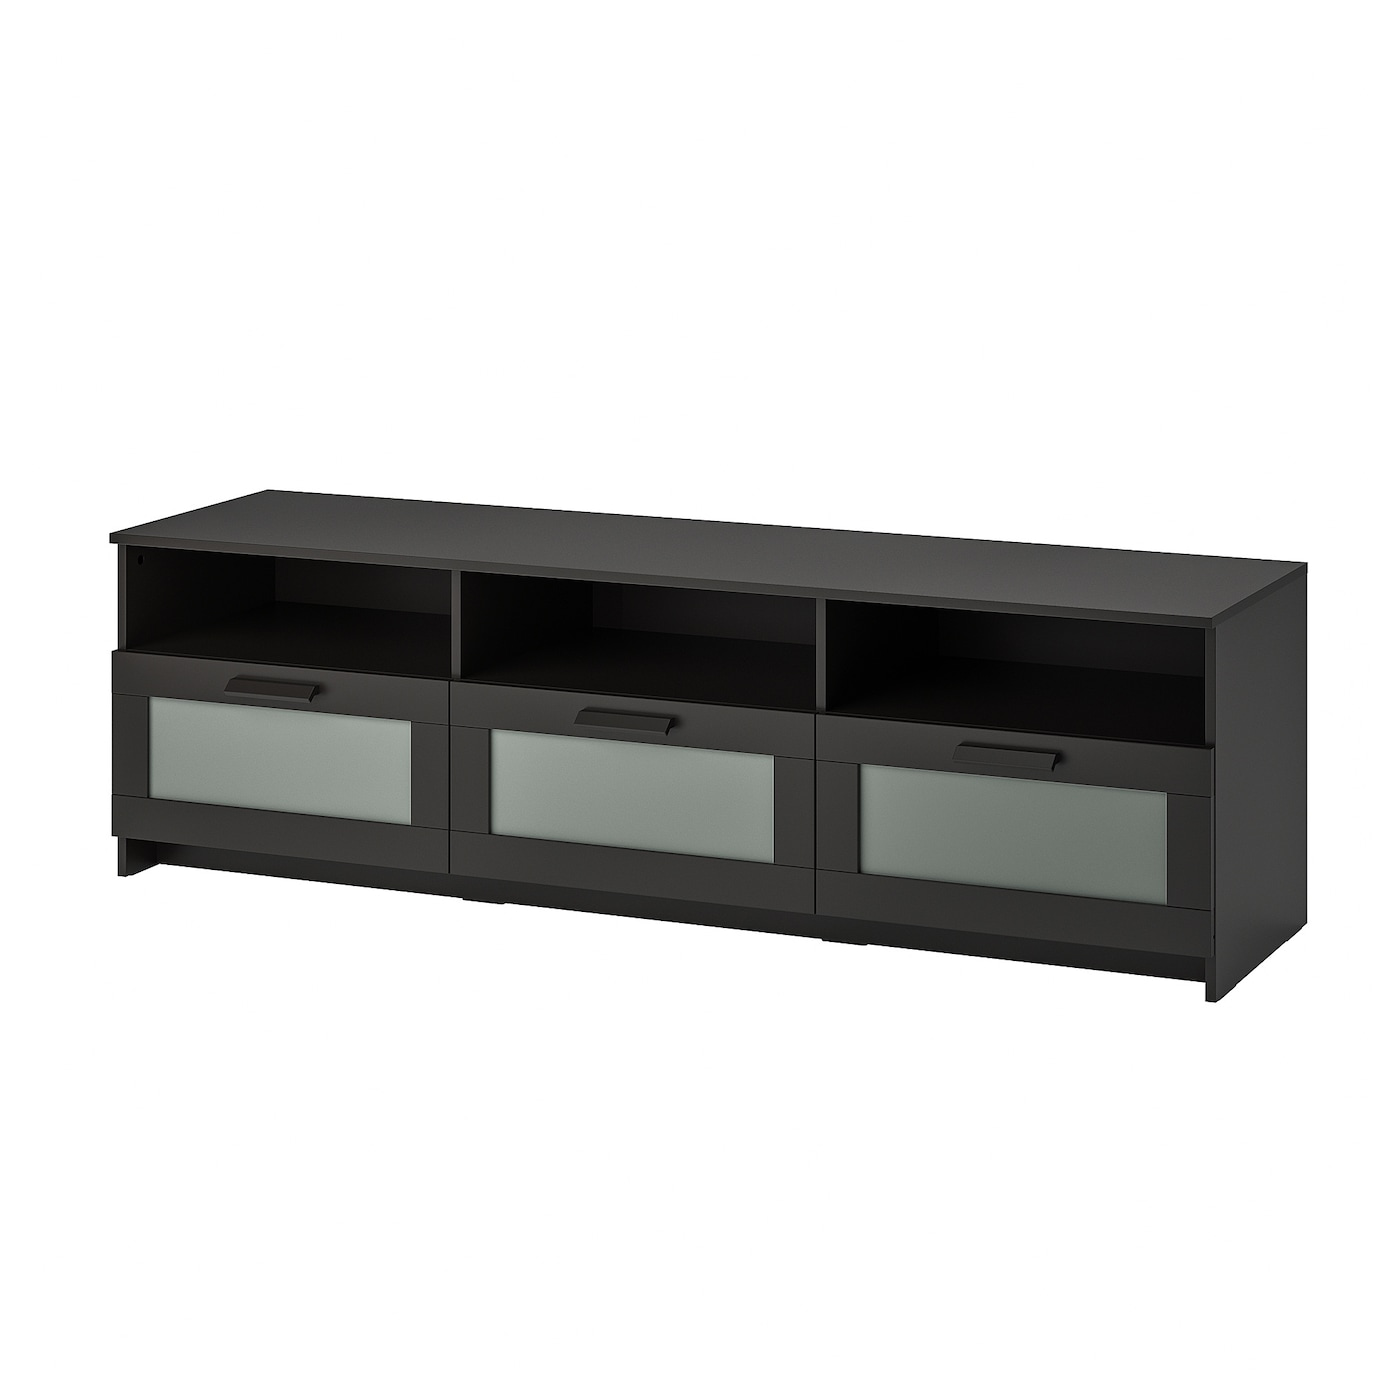 BRIMNES - TV bench, black